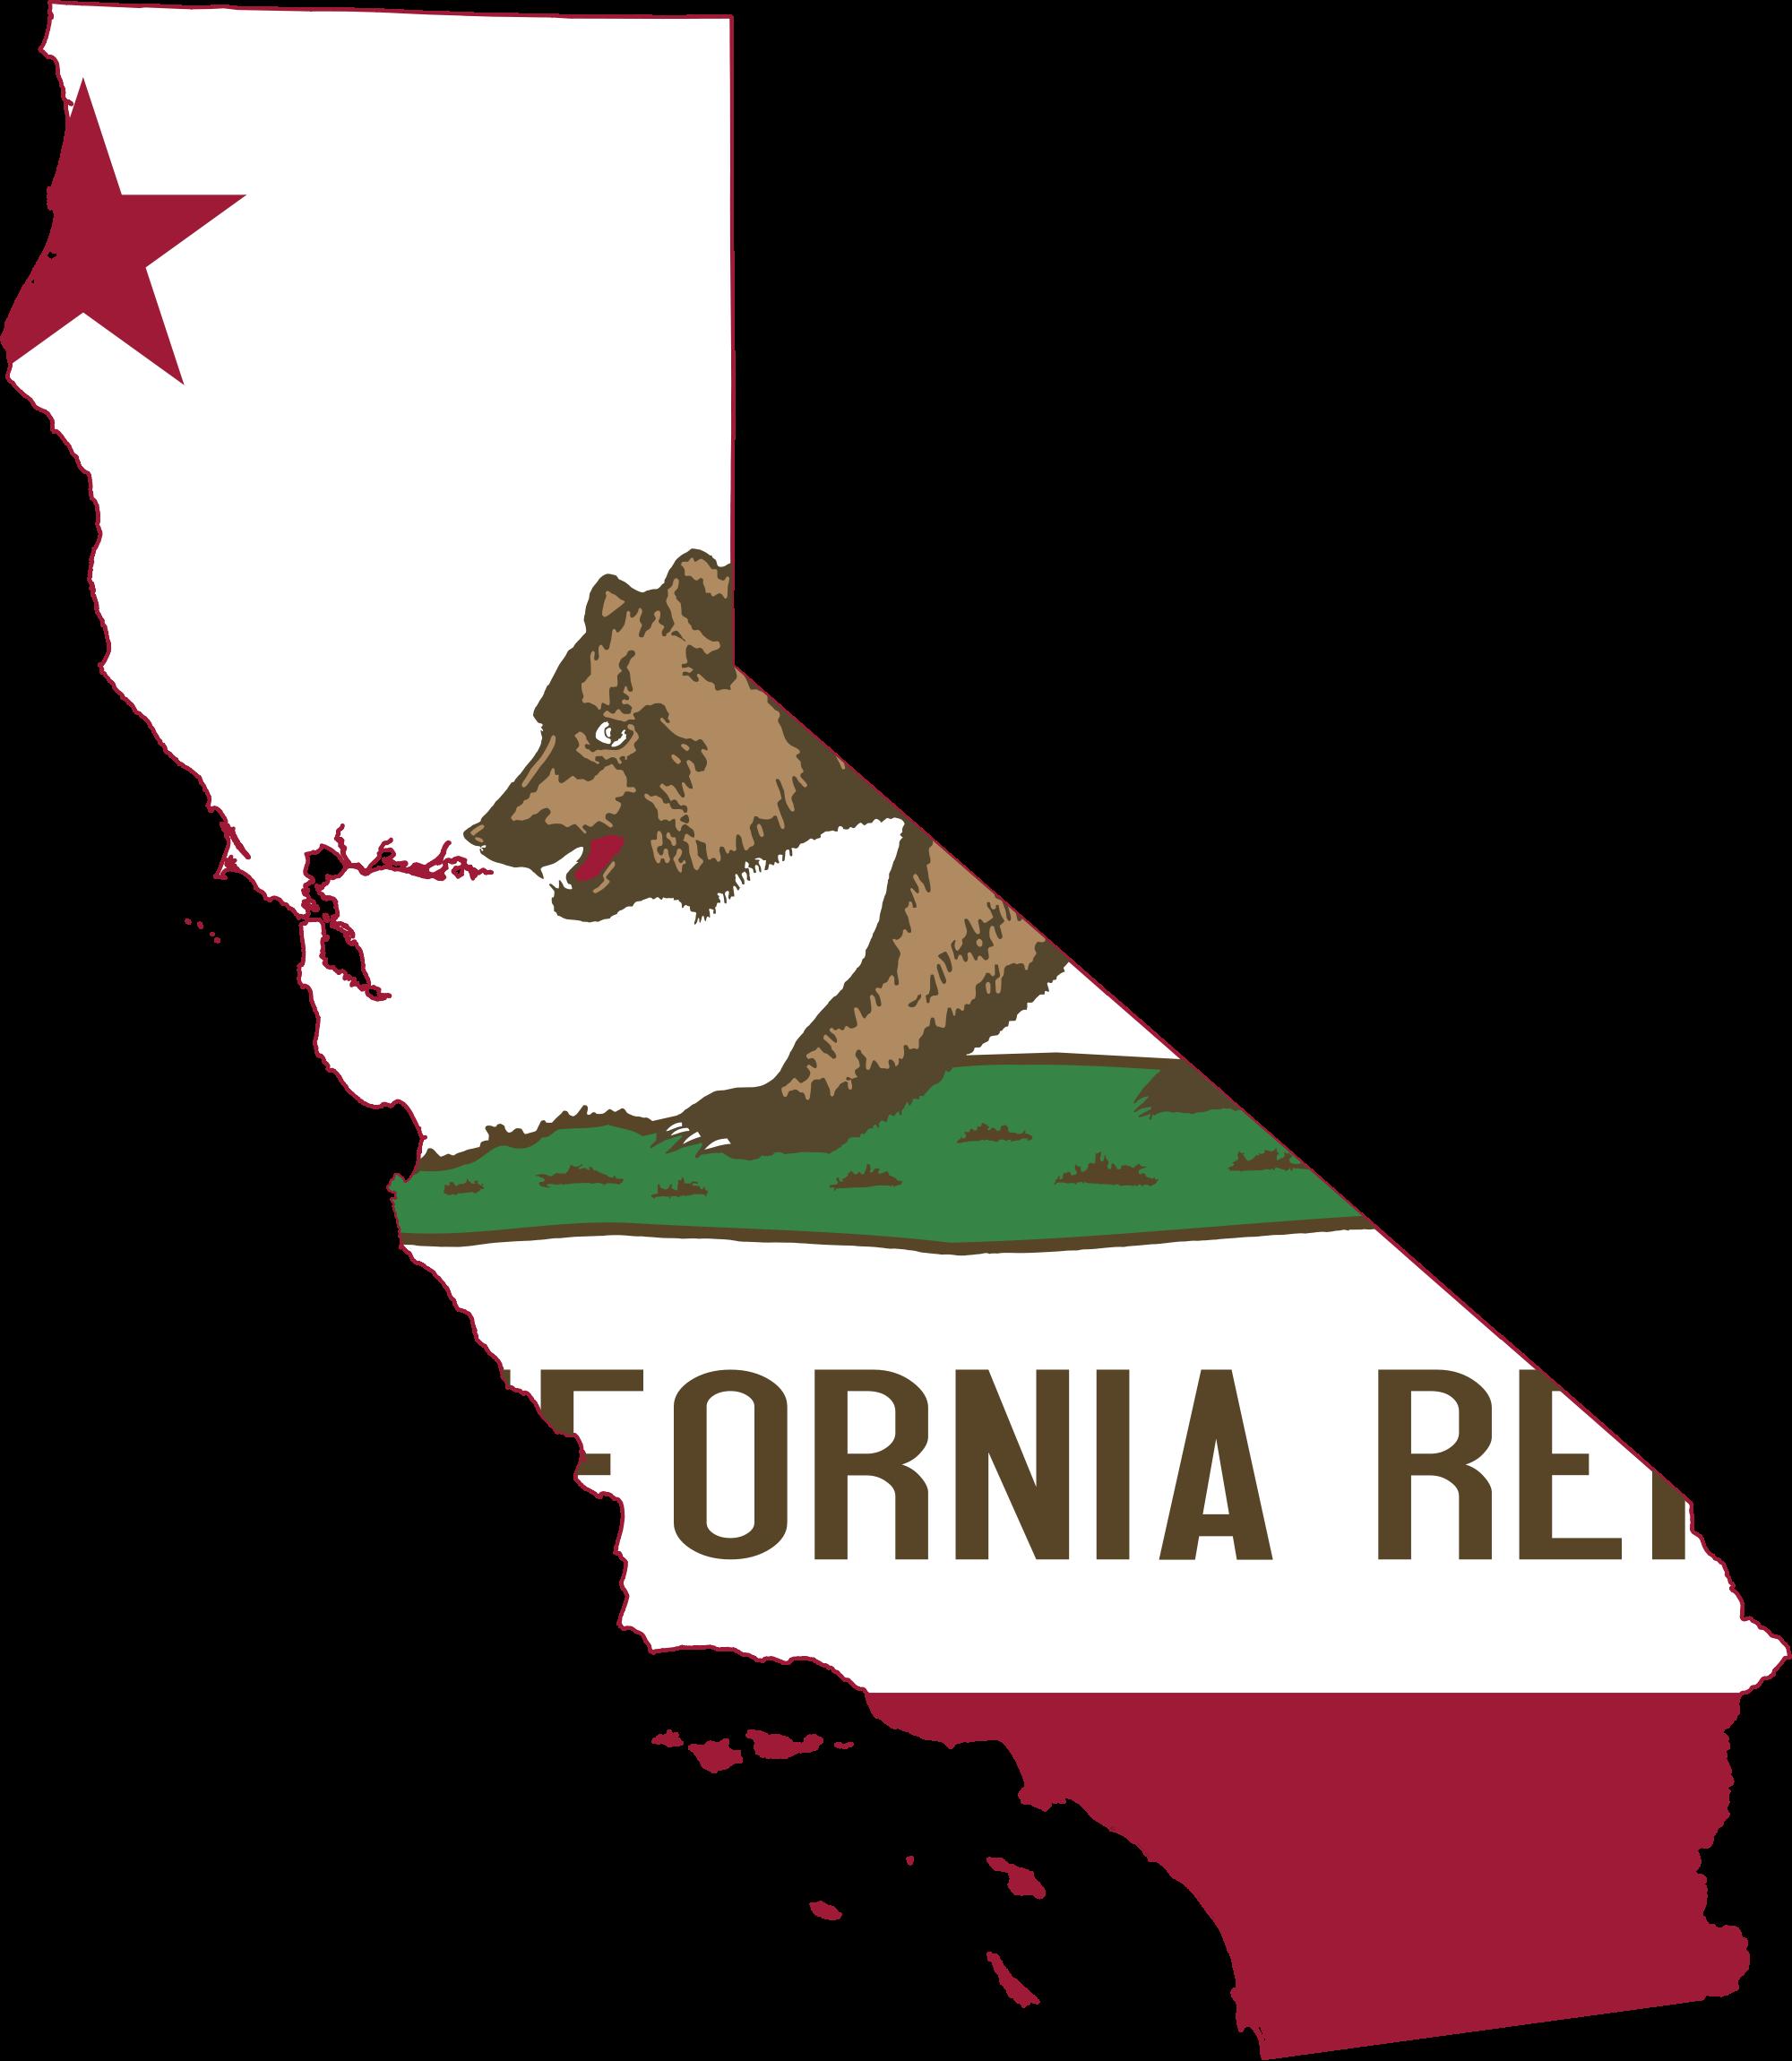 California Business Loans, Los Angeles, San Diego, San Francisco